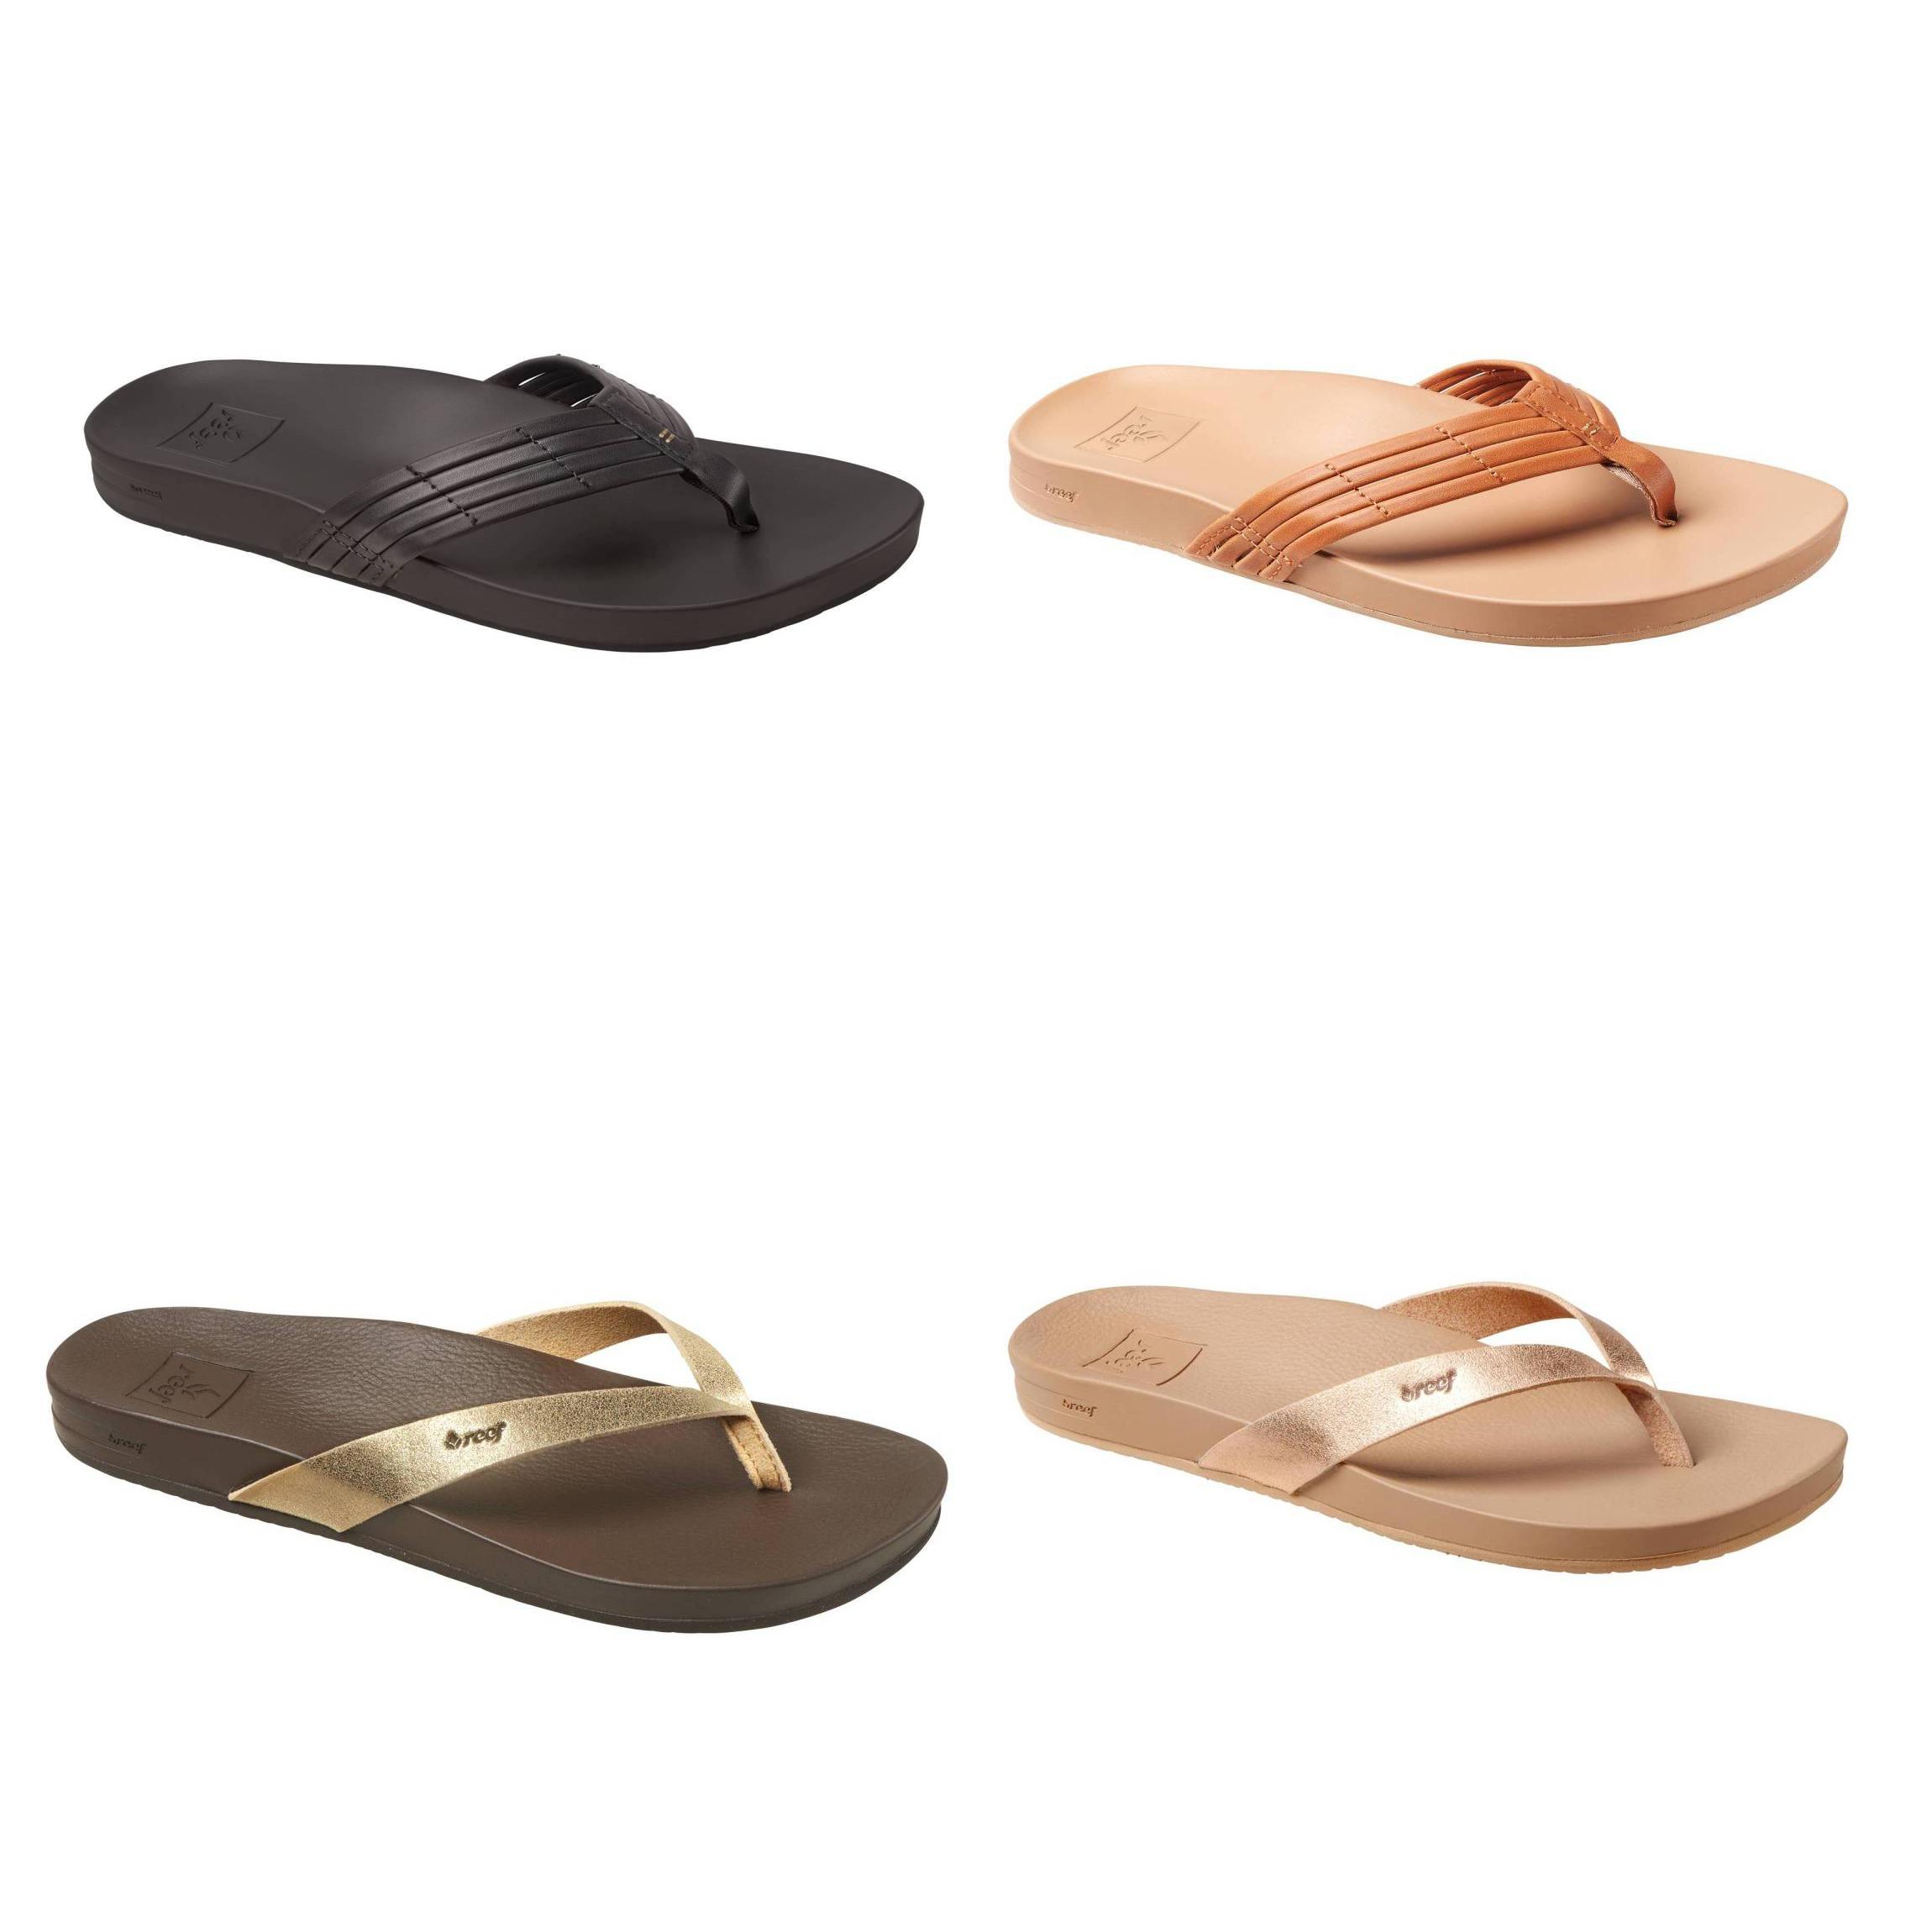 REEF Cushion Bounce Sunny Zehentrenner Zehenstegsandale Schuhe